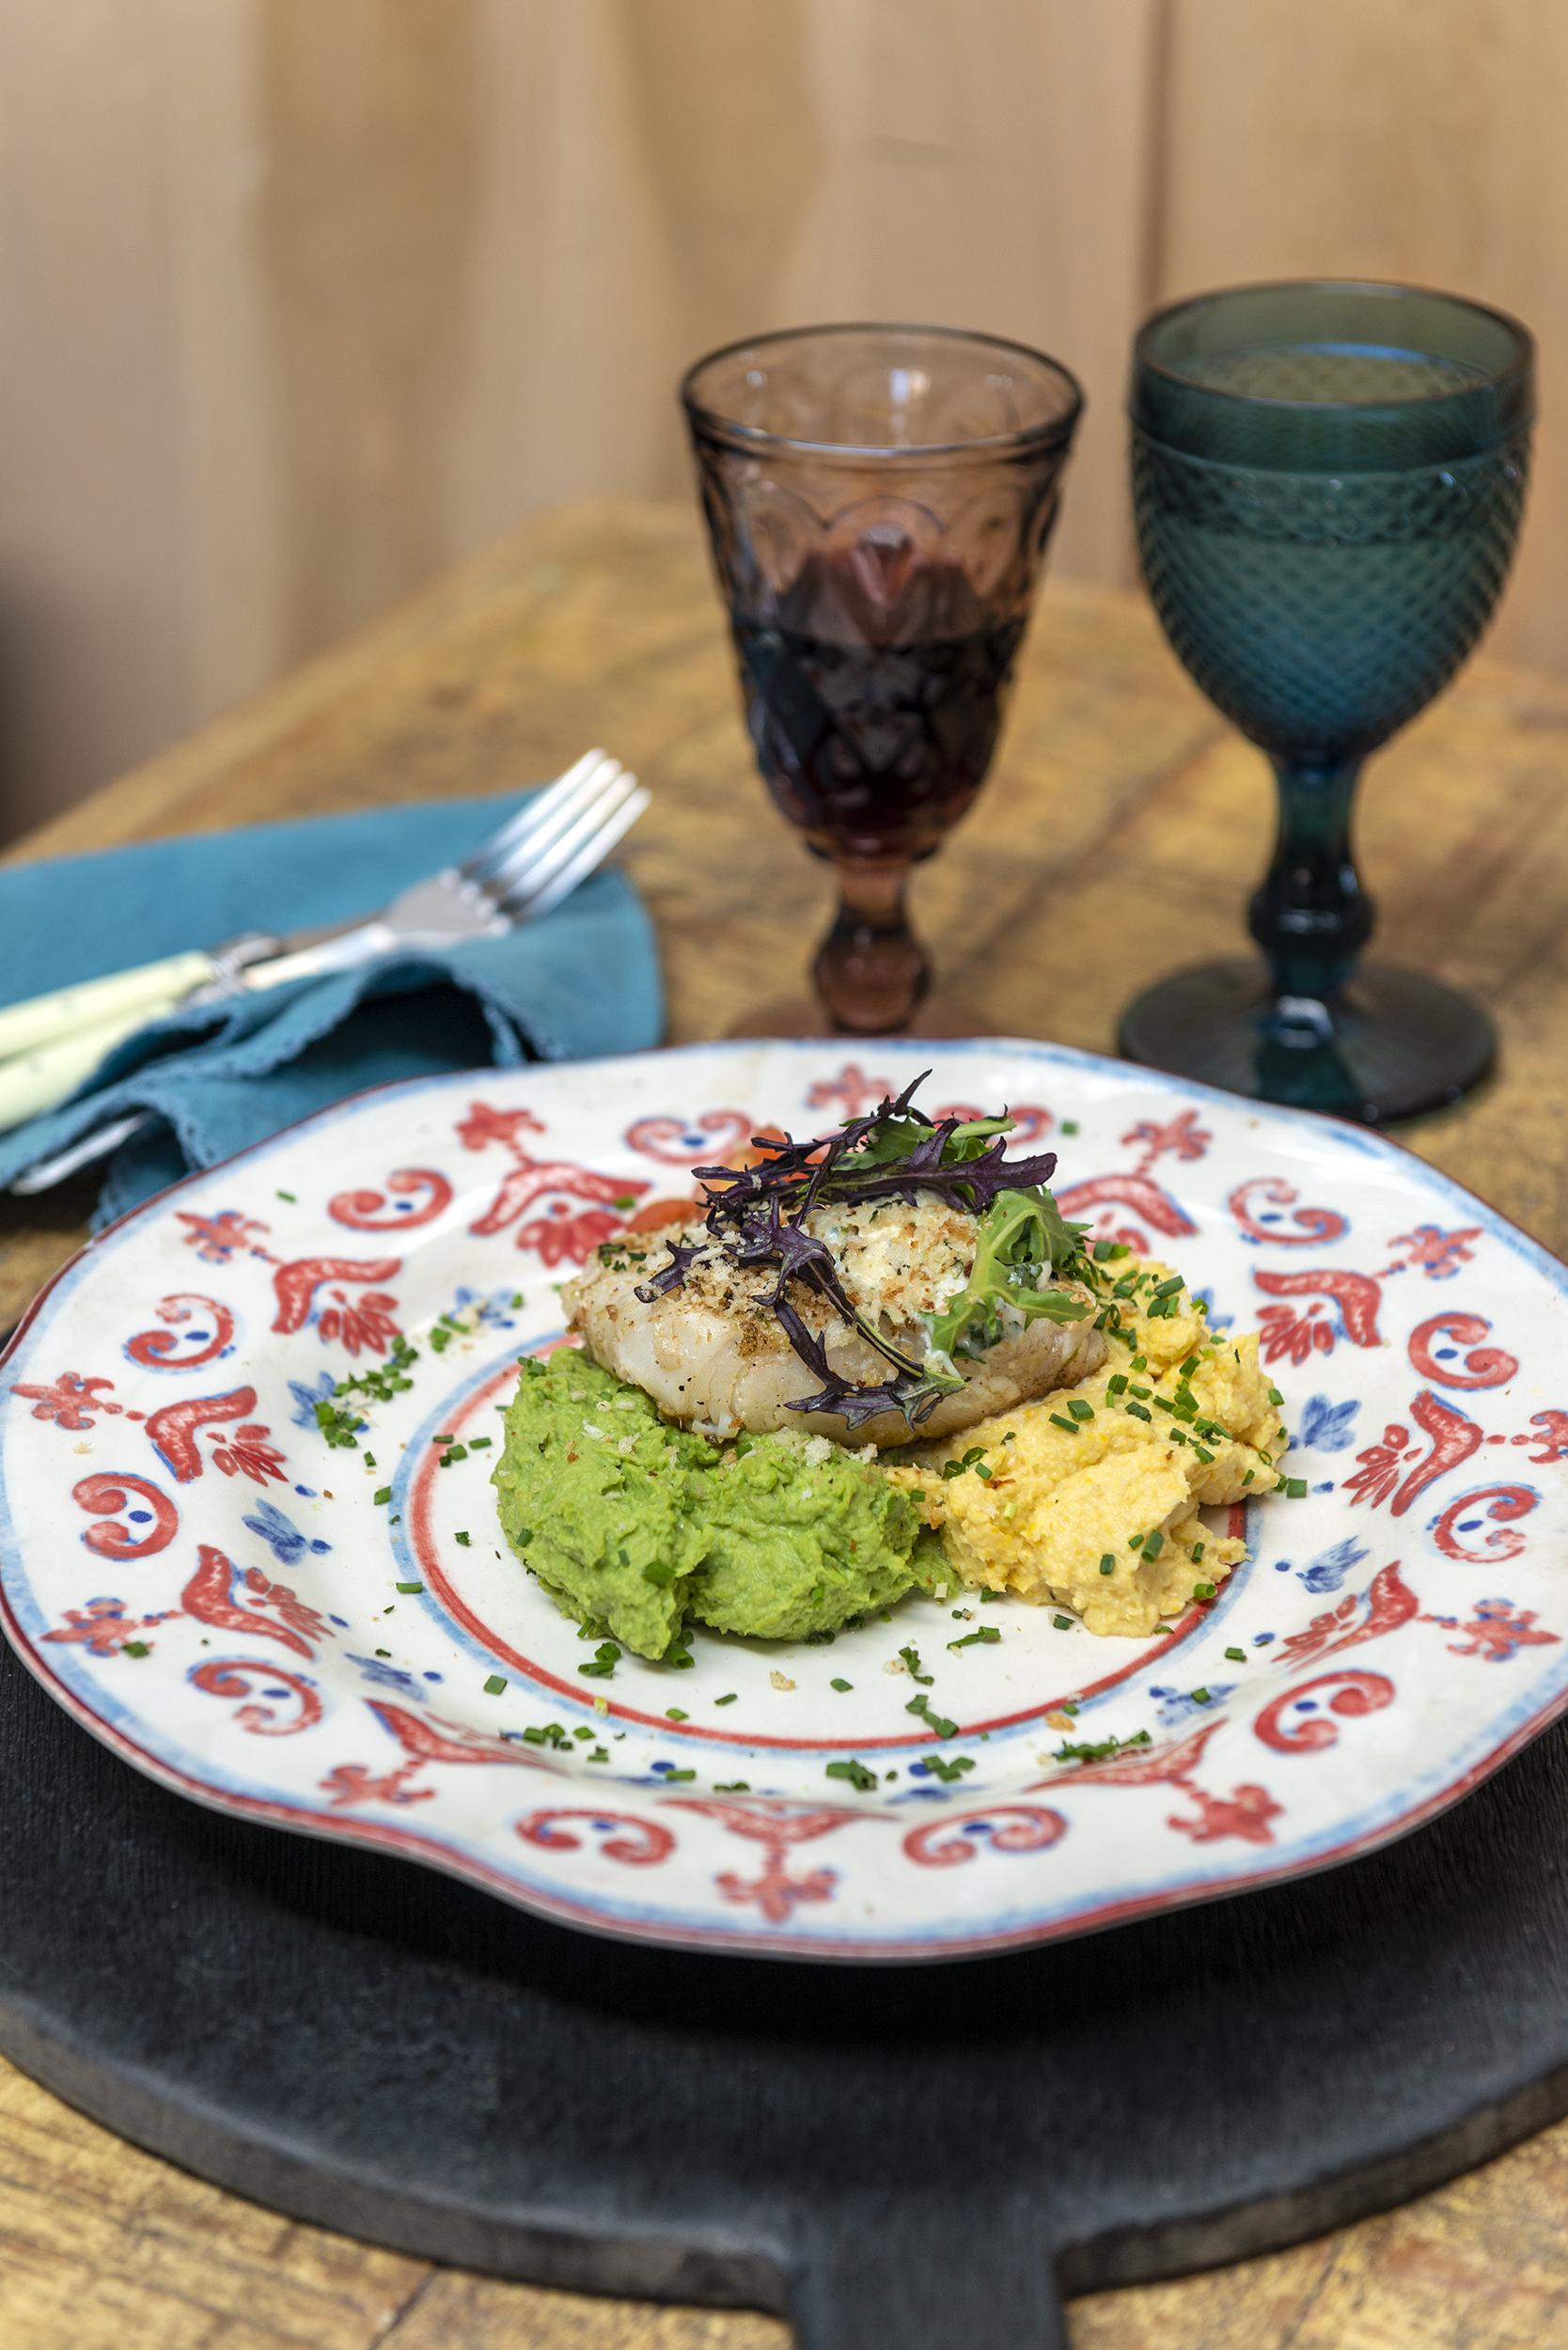 Tere Gutierrez – Espacial ED Gourmet